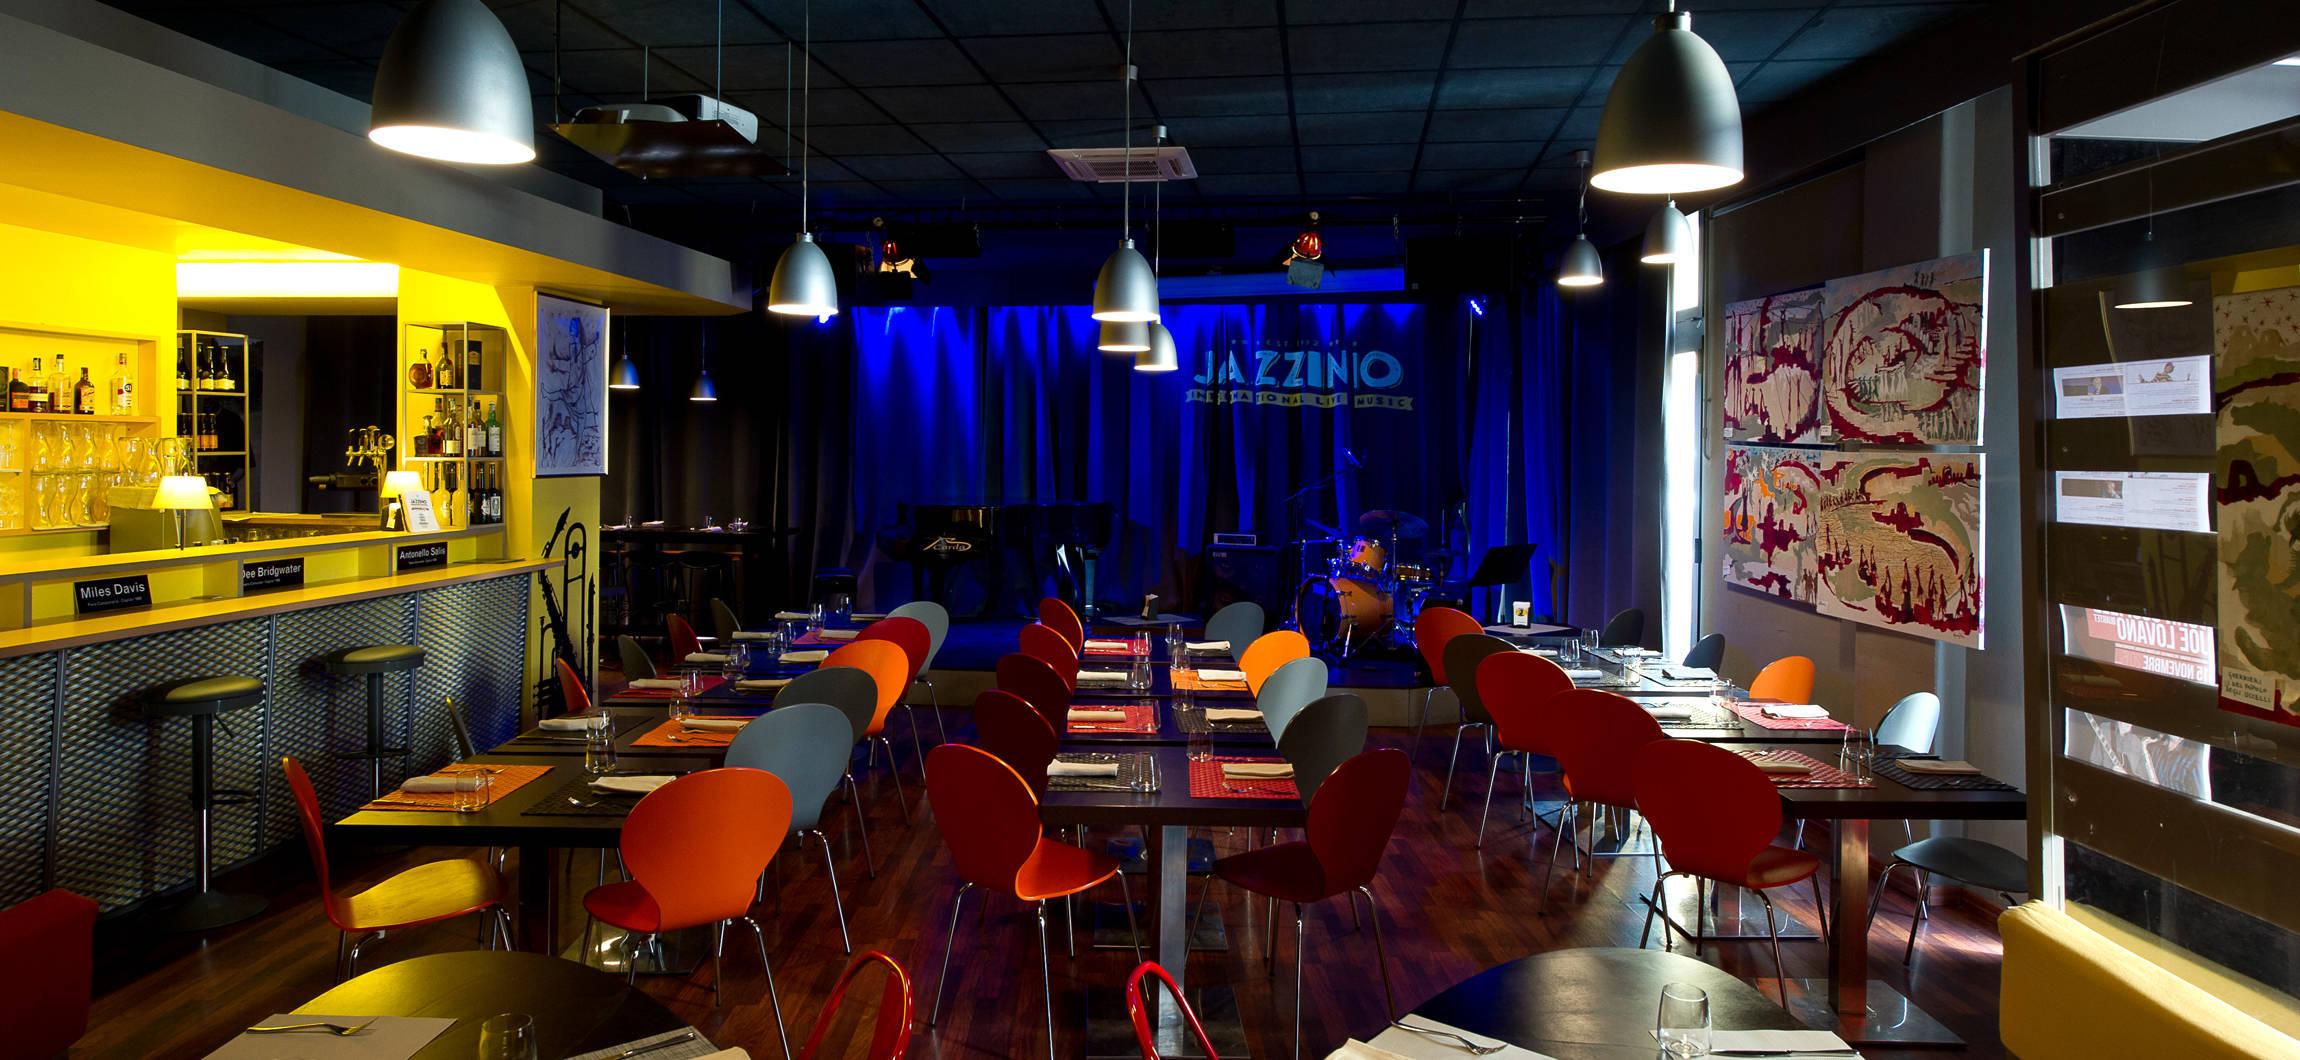 jazzino_2300x1060-_m